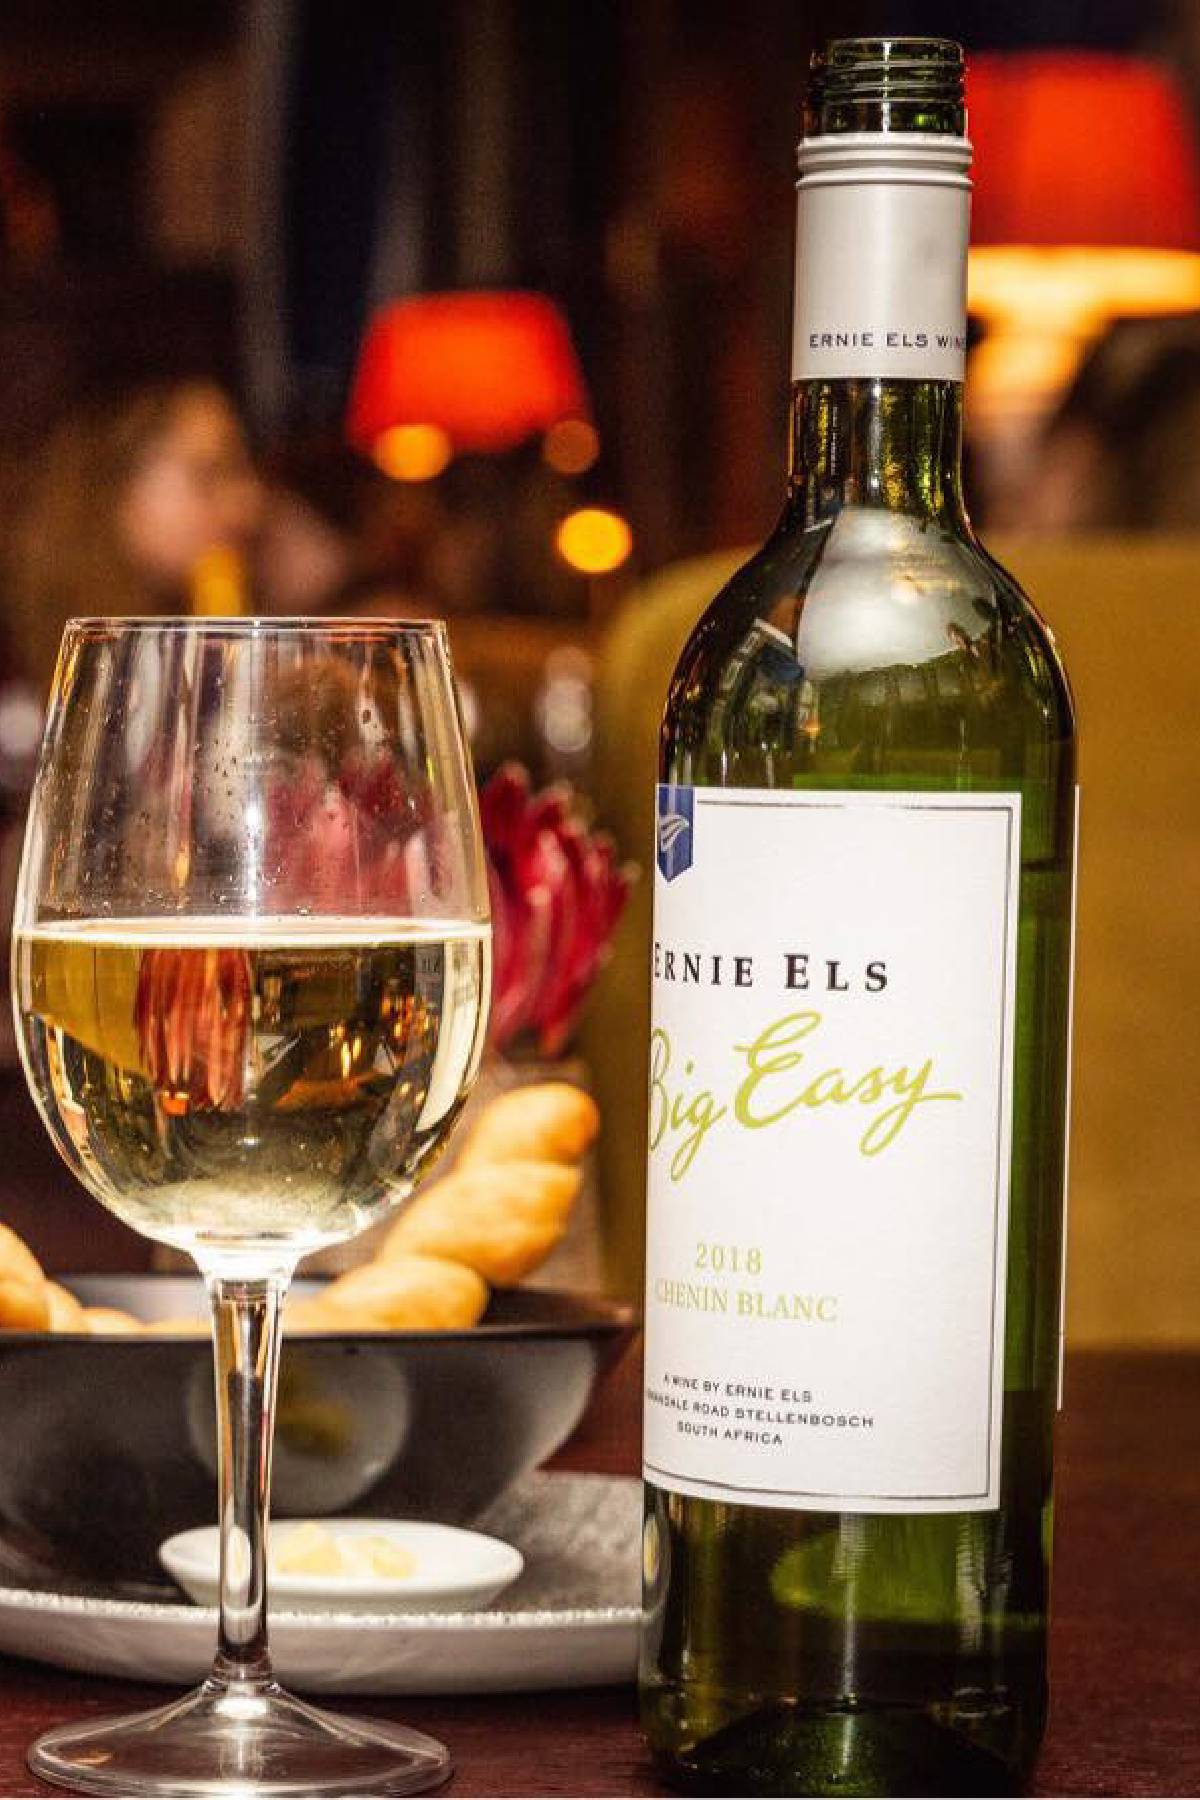 Ernie Els Big Easy Chenin Blanc